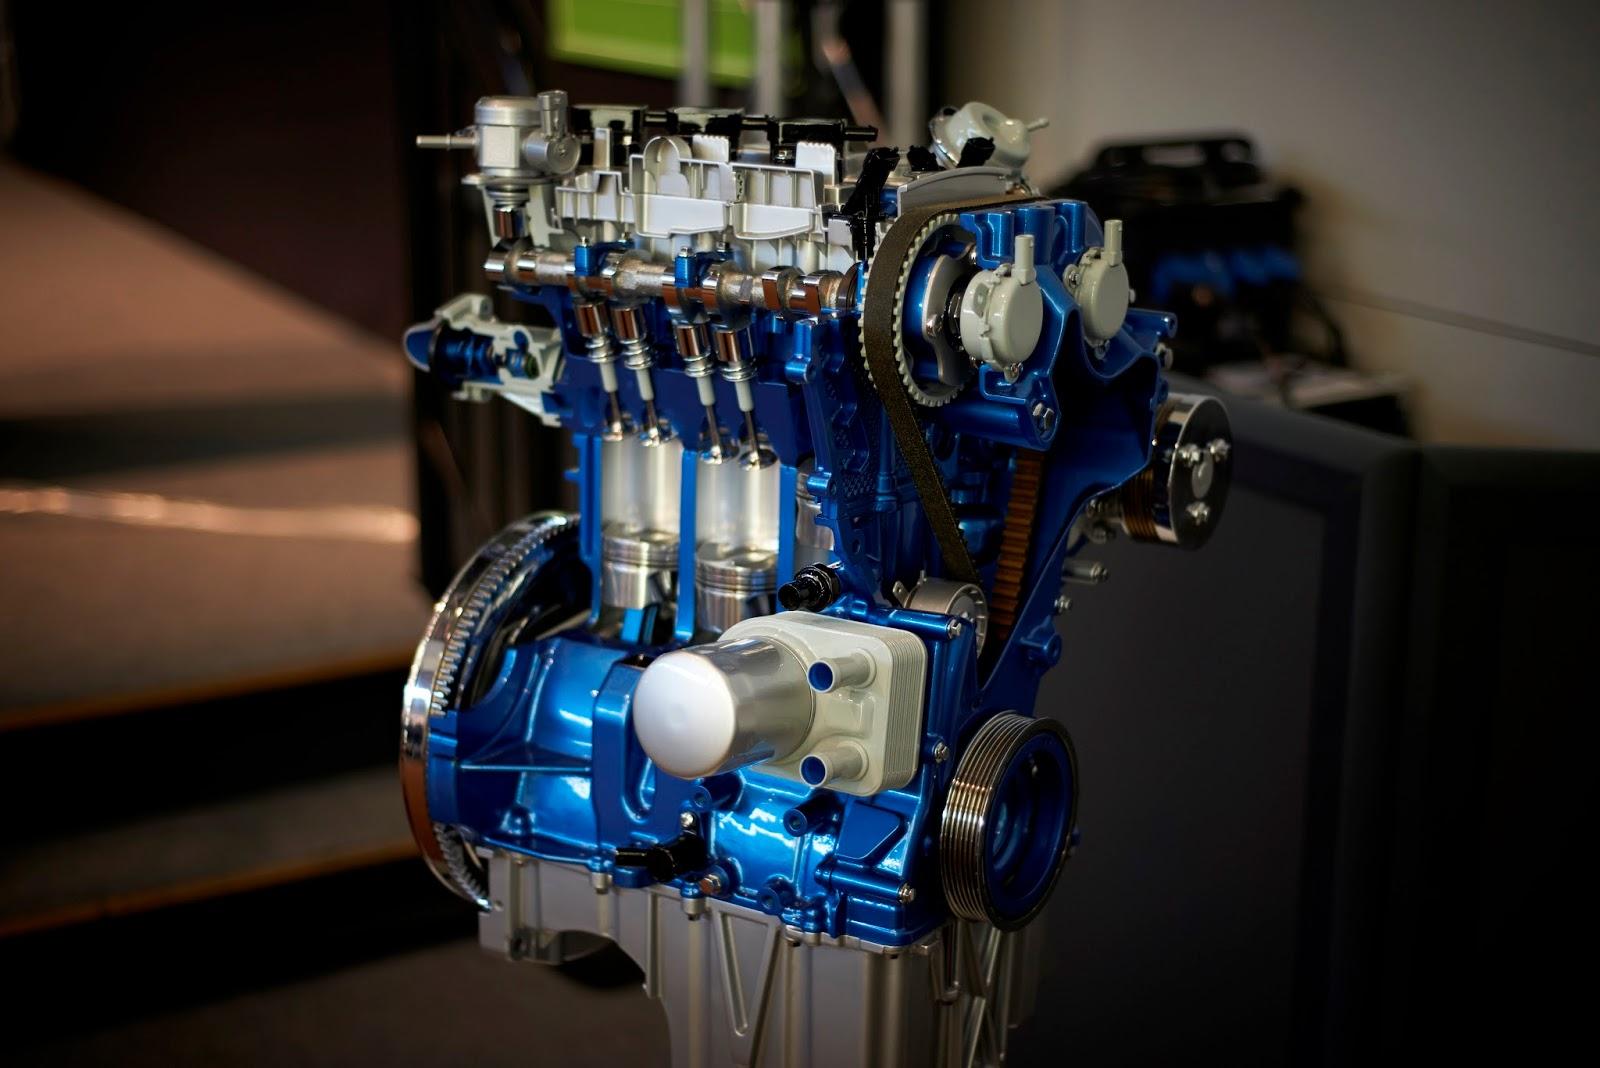 Ford2BEcoBoost2Bengine2Bwins2Beighth2BIEOTY2Baward Ο χιλιάρης Ford EcoBoost για 5η συνεχόμενη χρονιά αναδείχθηκε καλύτερος μικρός κινητήρας Engine, Ford